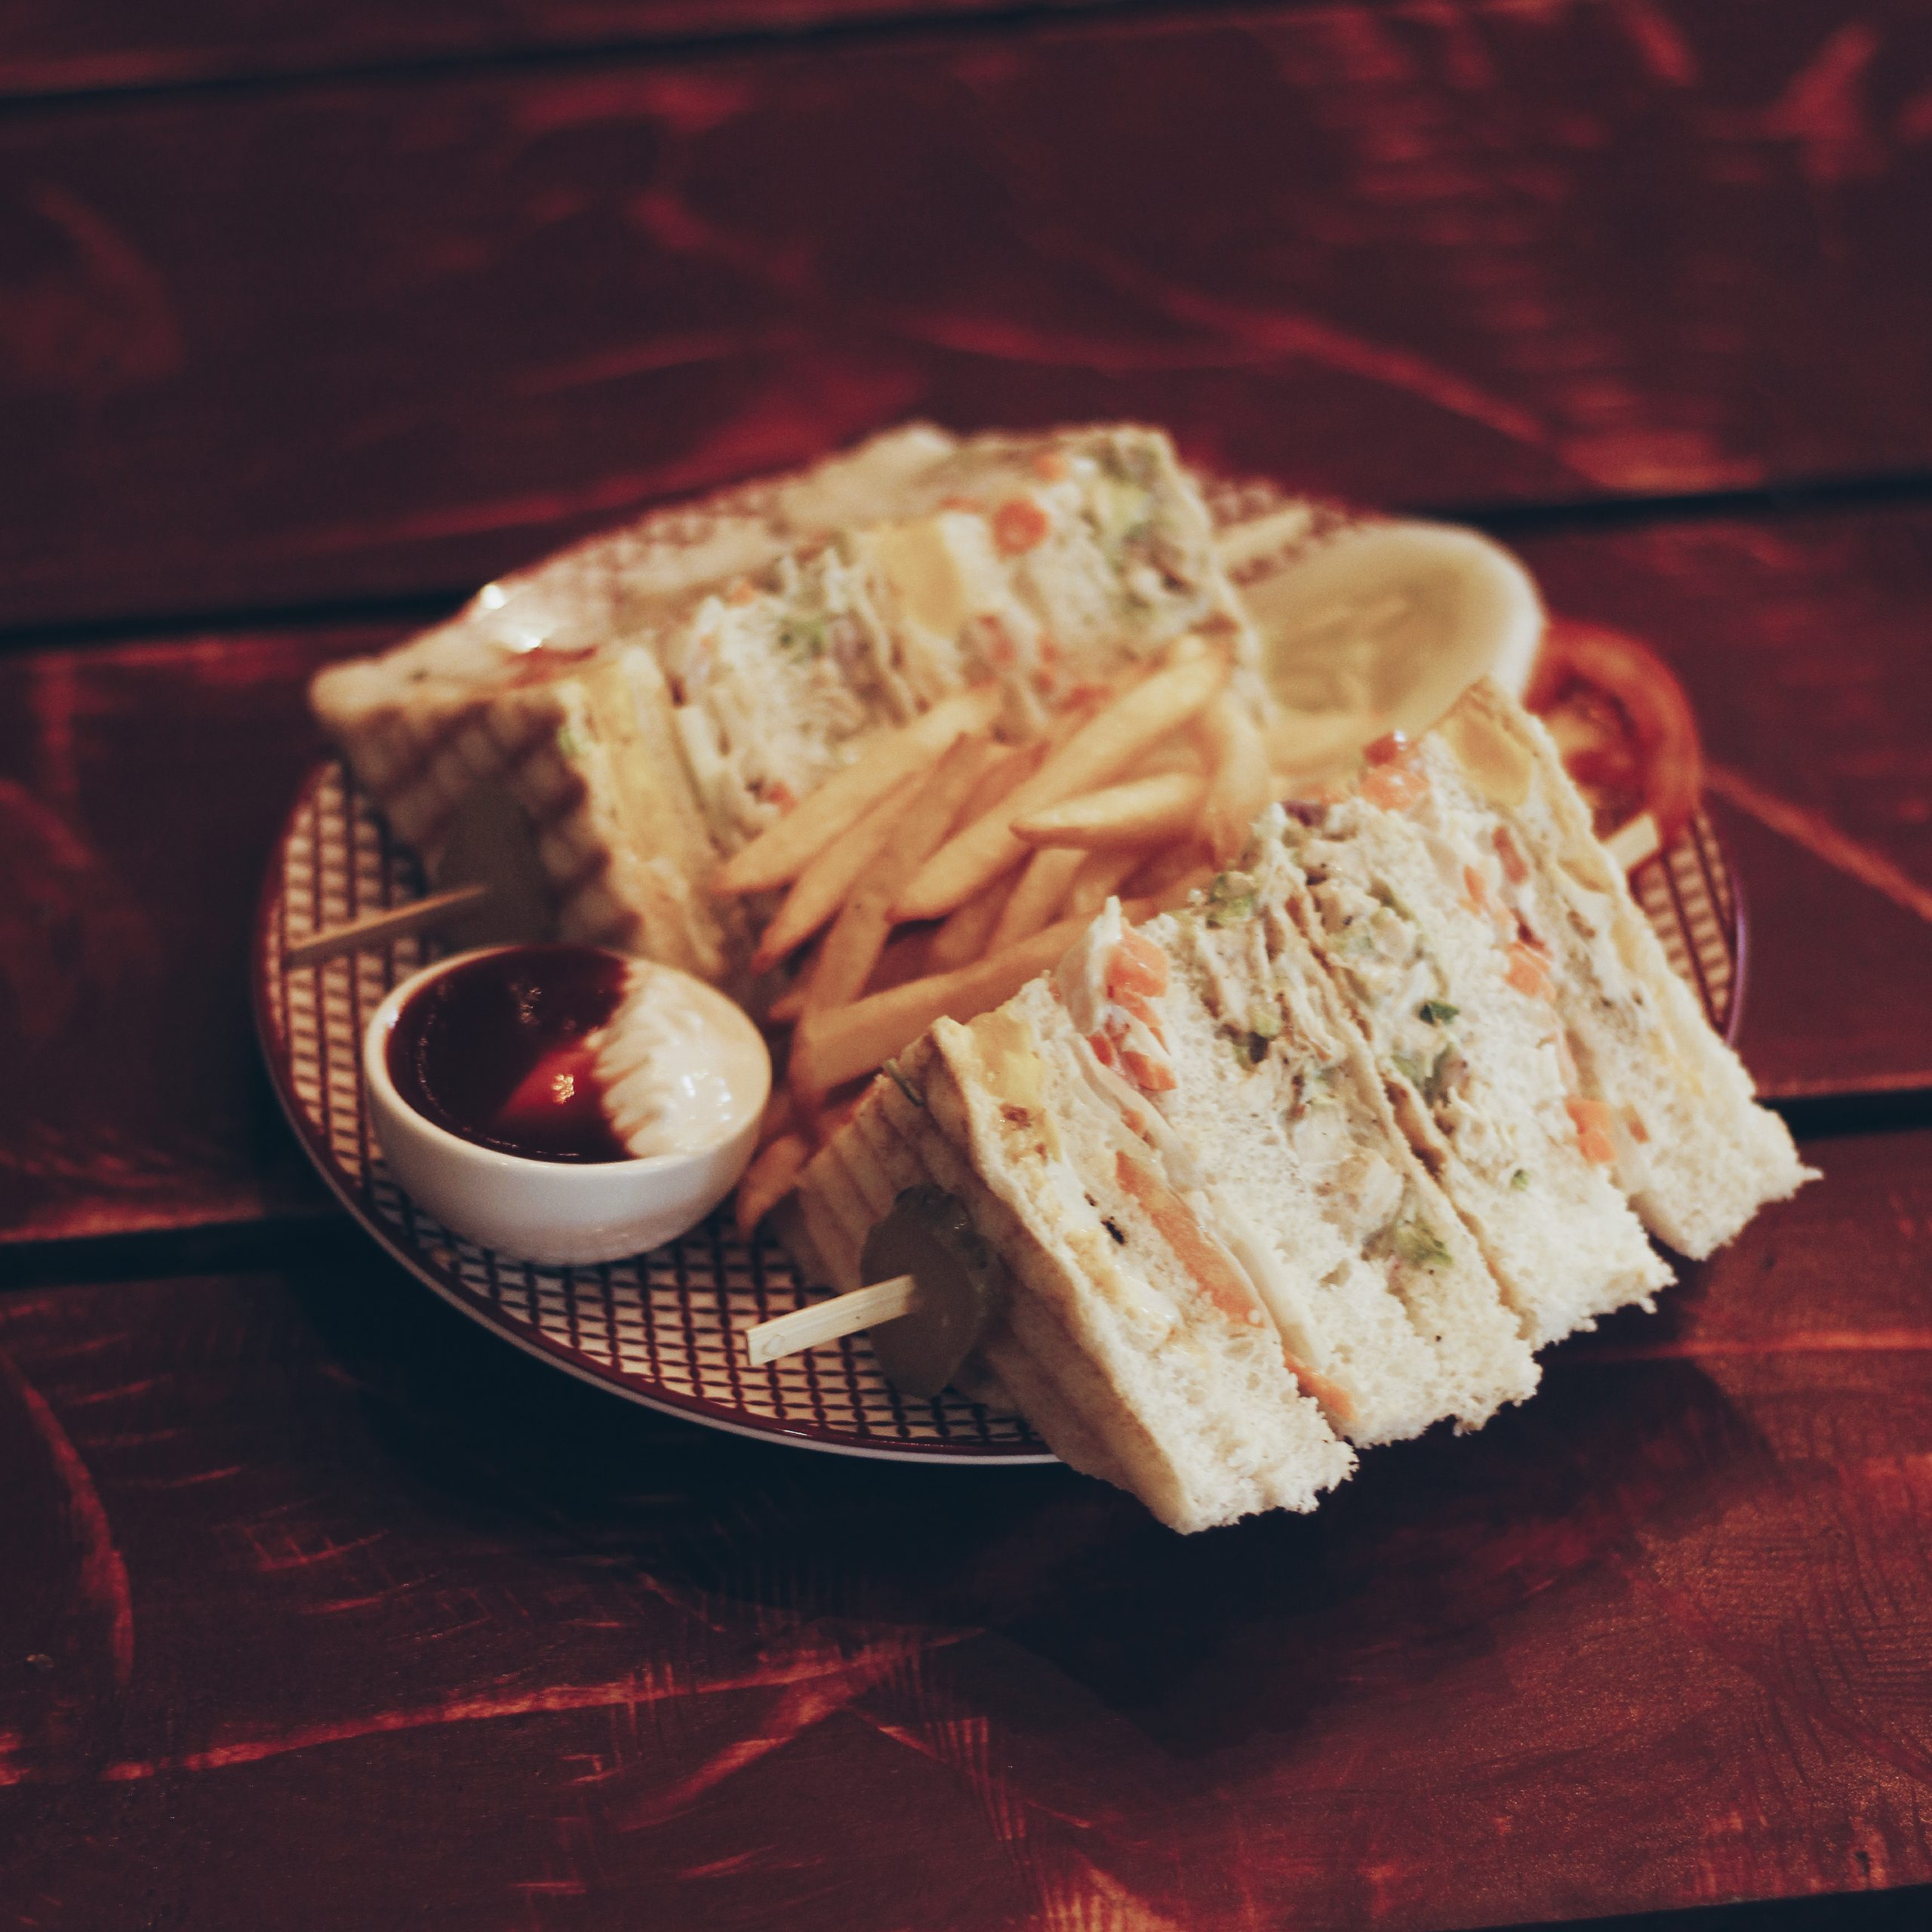 Club sandwich in a plate